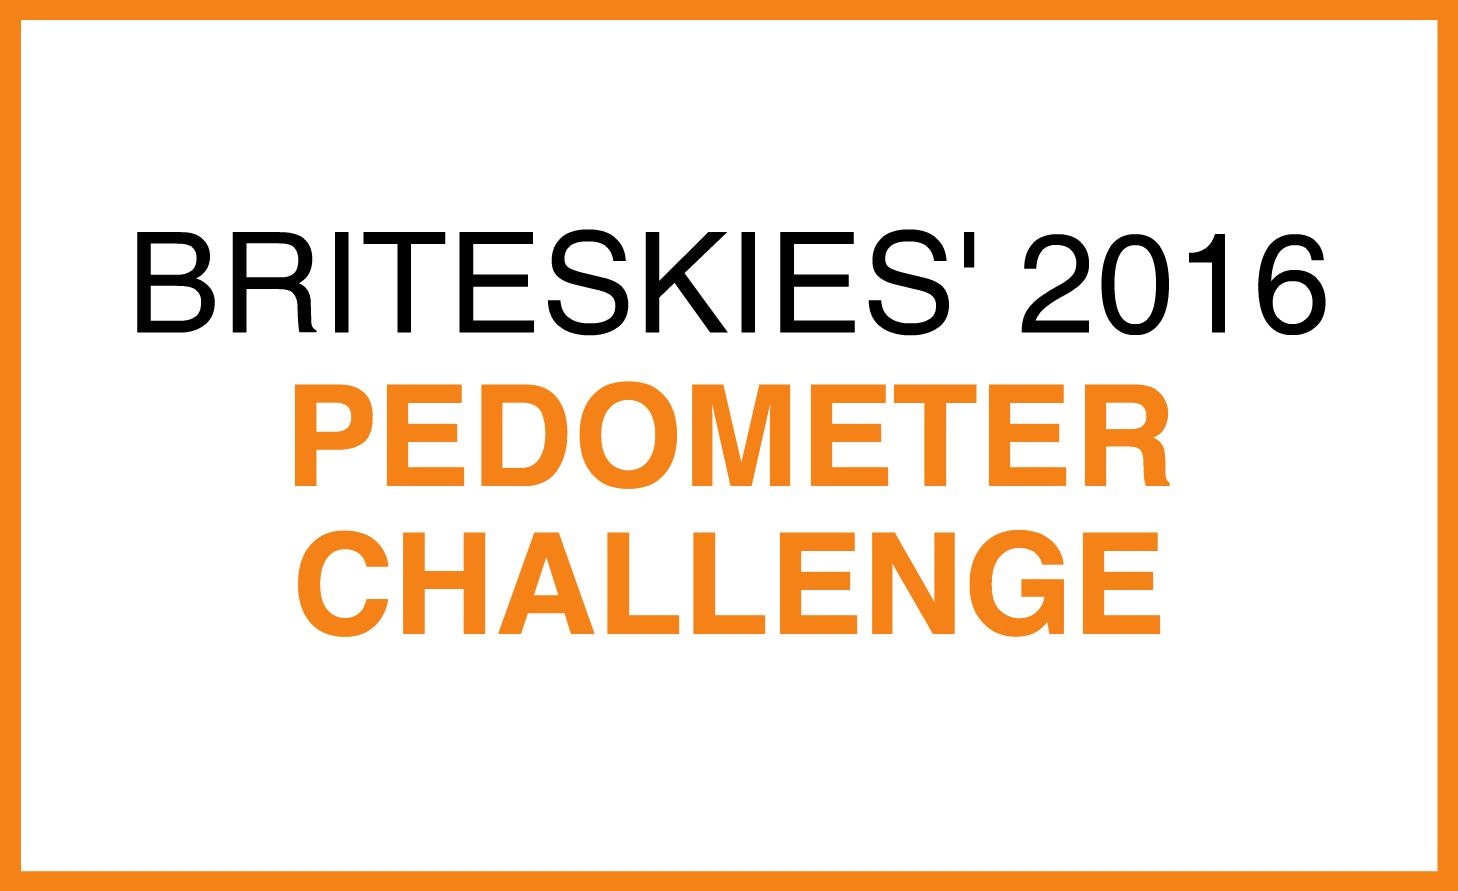 pedometer challenge.png